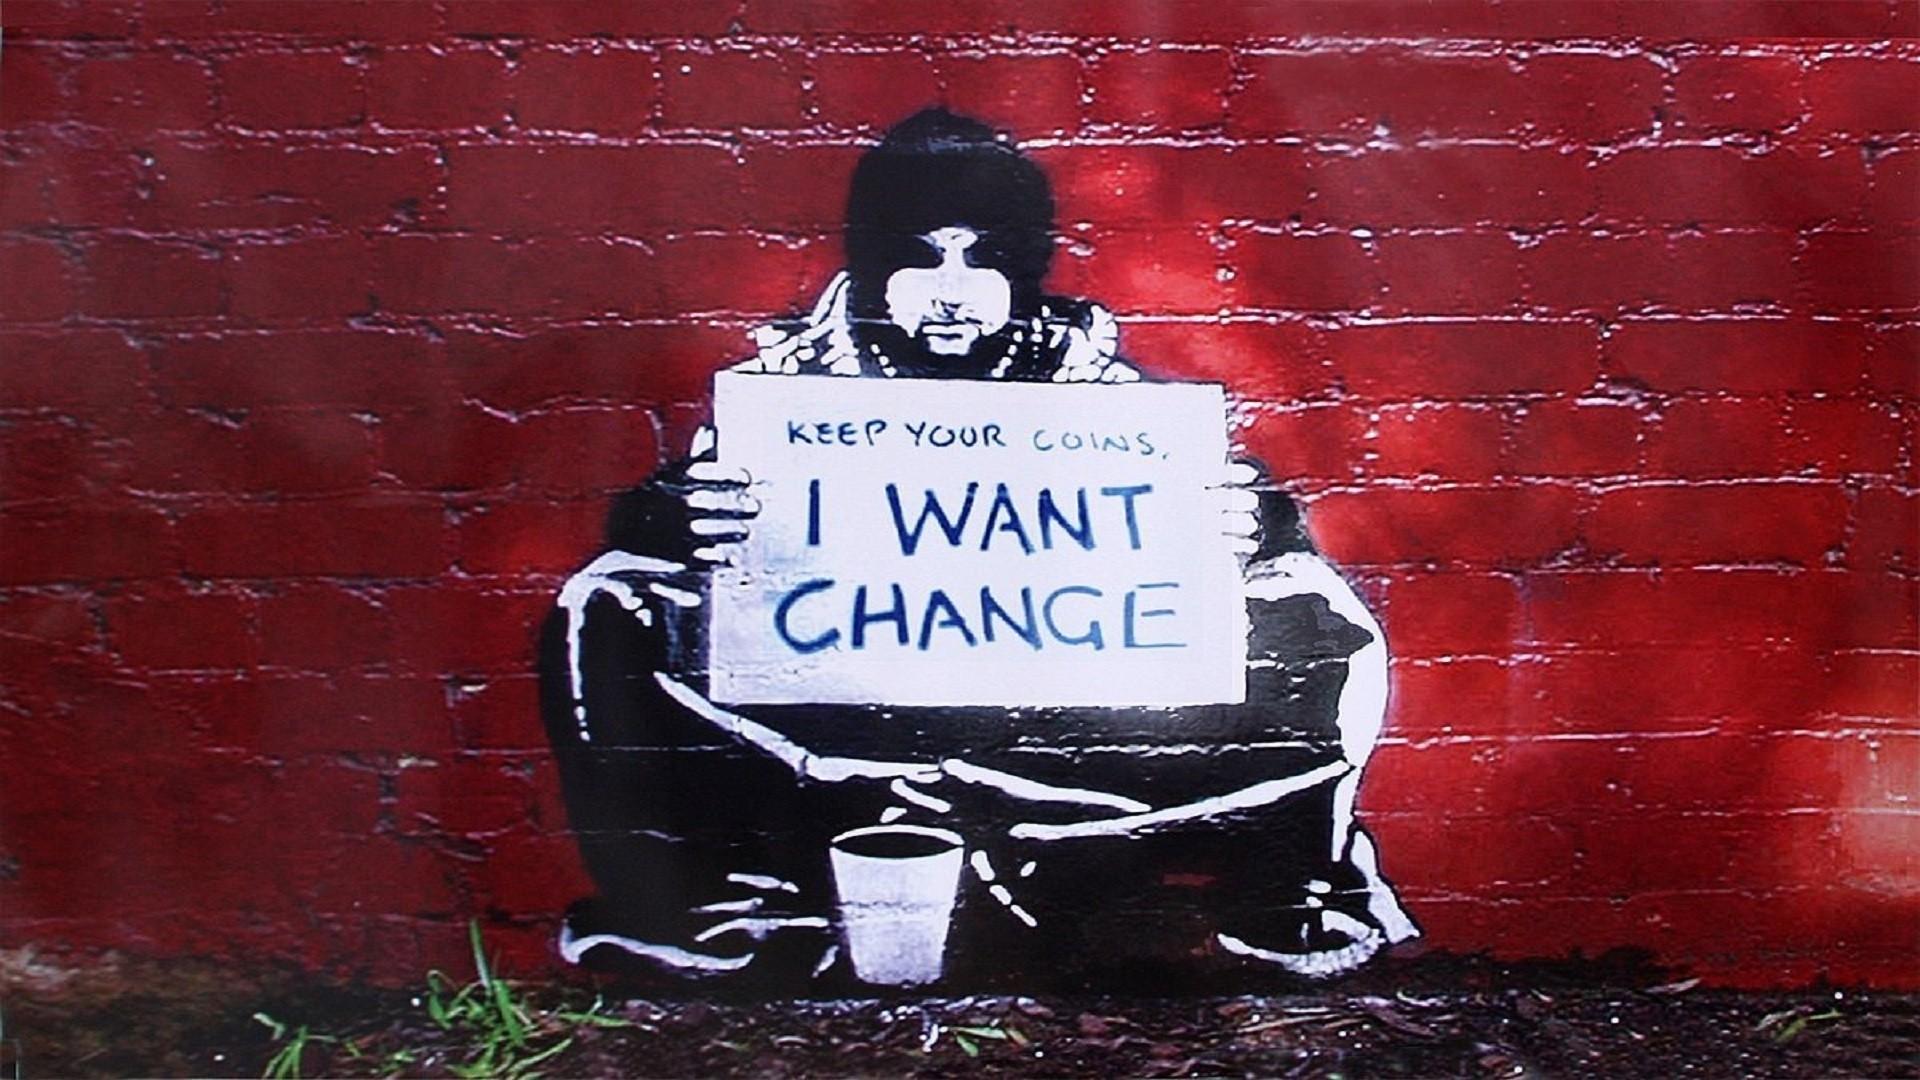 banksy, red, red wall, graffiti, street art, i want .